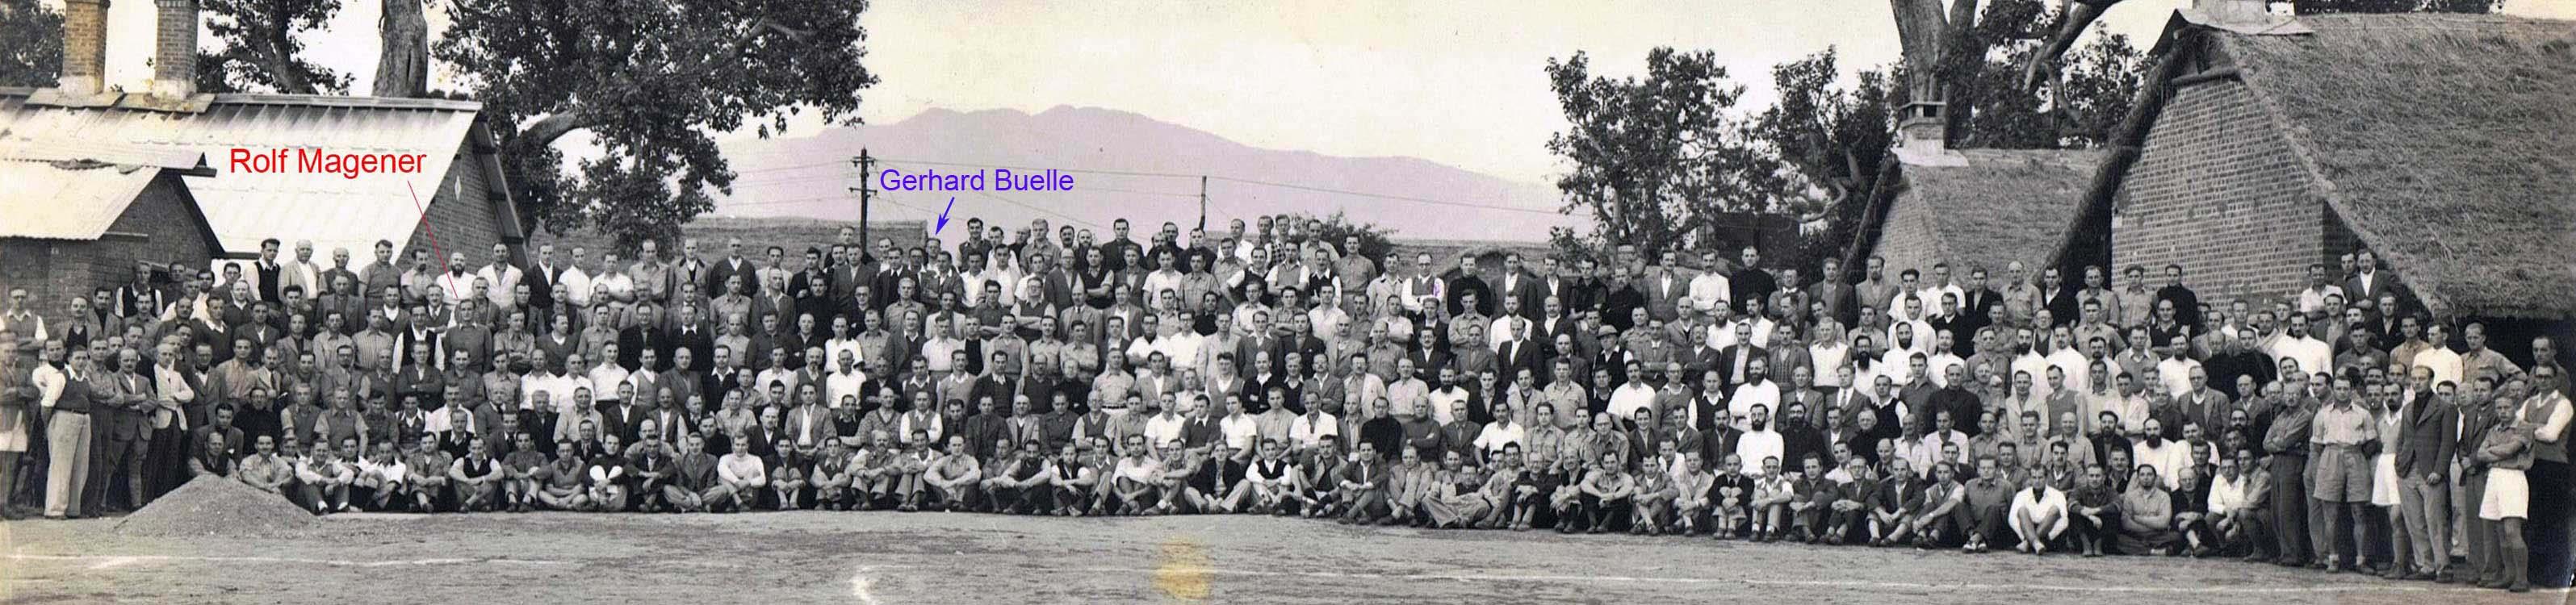 Dehradun Internment Camp 1941